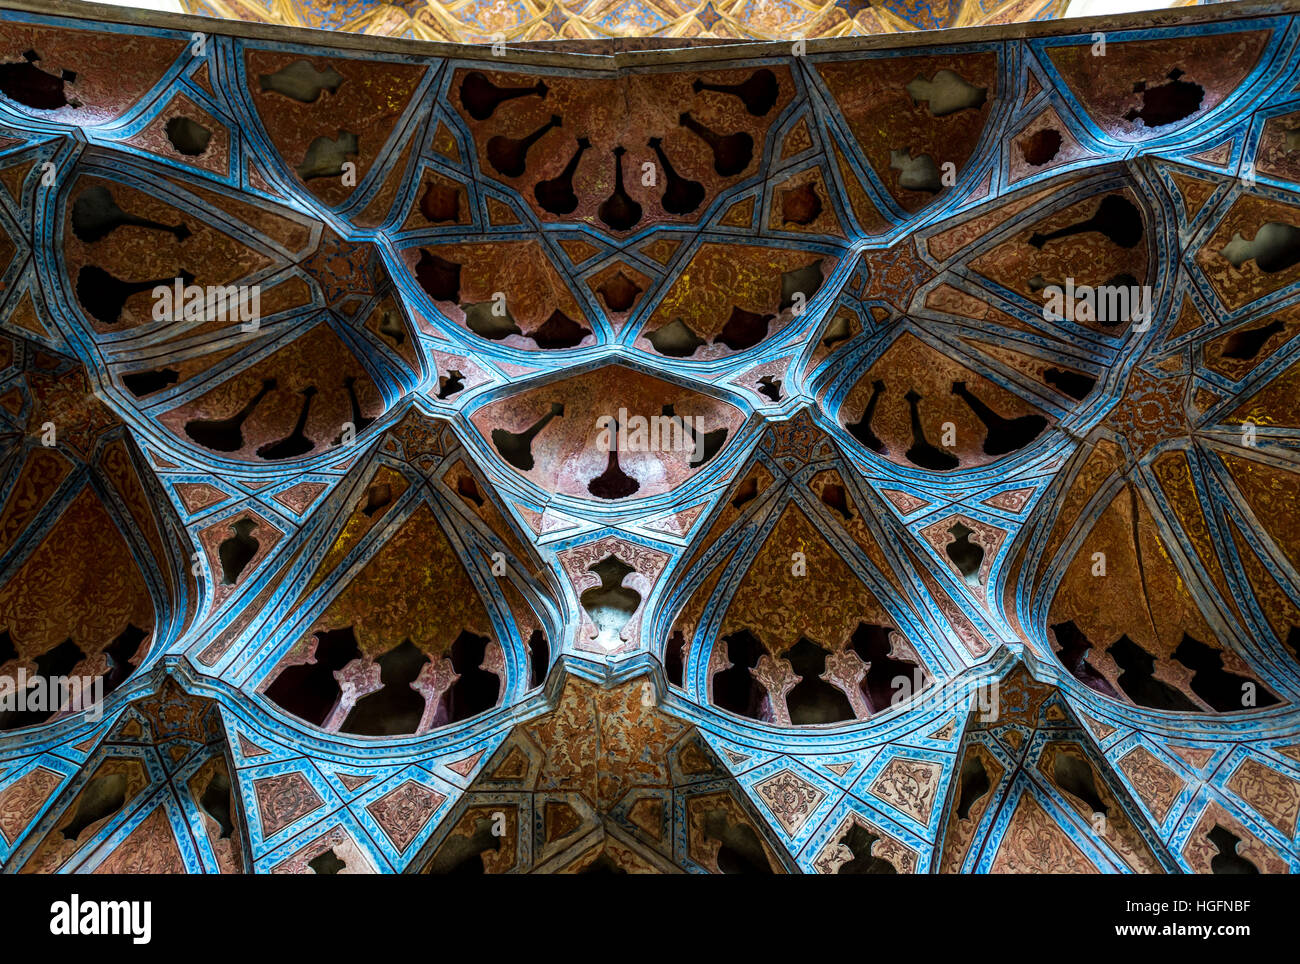 Ceiling of Music Hall in Safavid grand palace Ali Qapu located at Naqsh e Jahan Square in Isfahan, Iran Stock Photo